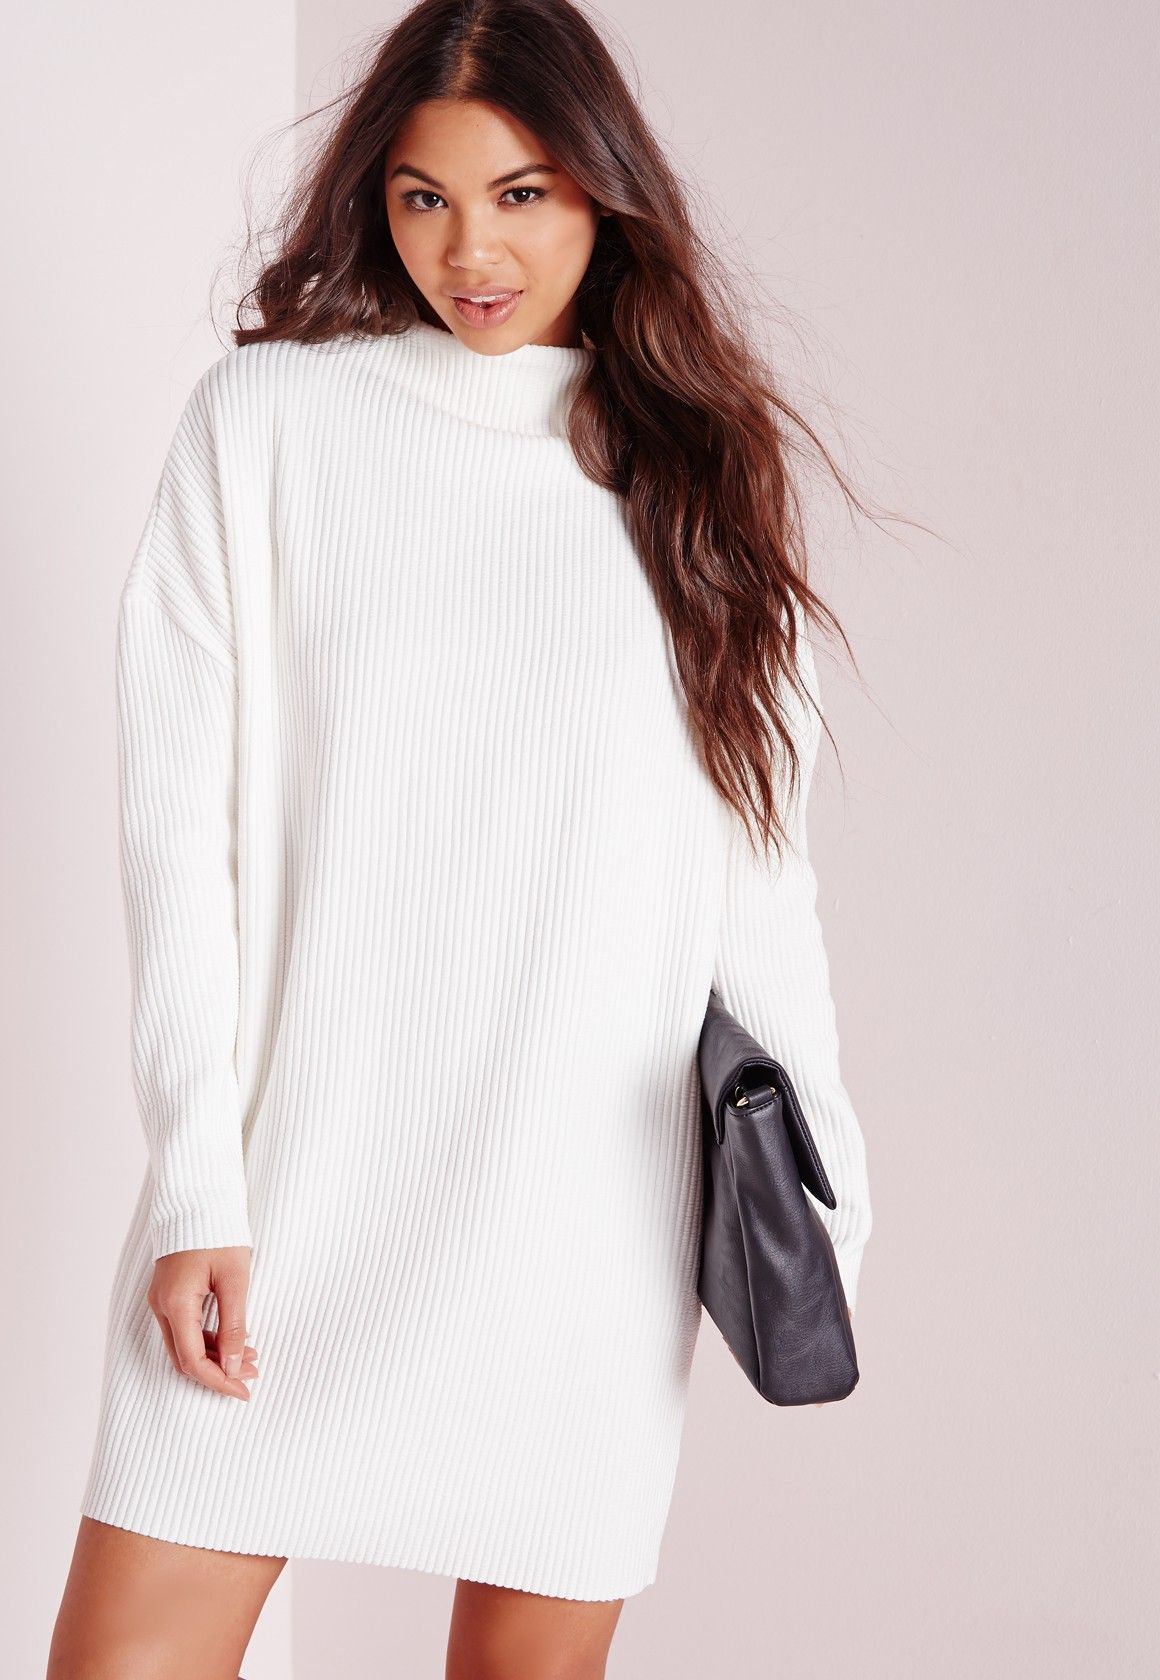 28 High Neck Slouchy Rib Sweater Dress Ivory - Dresses - day ...